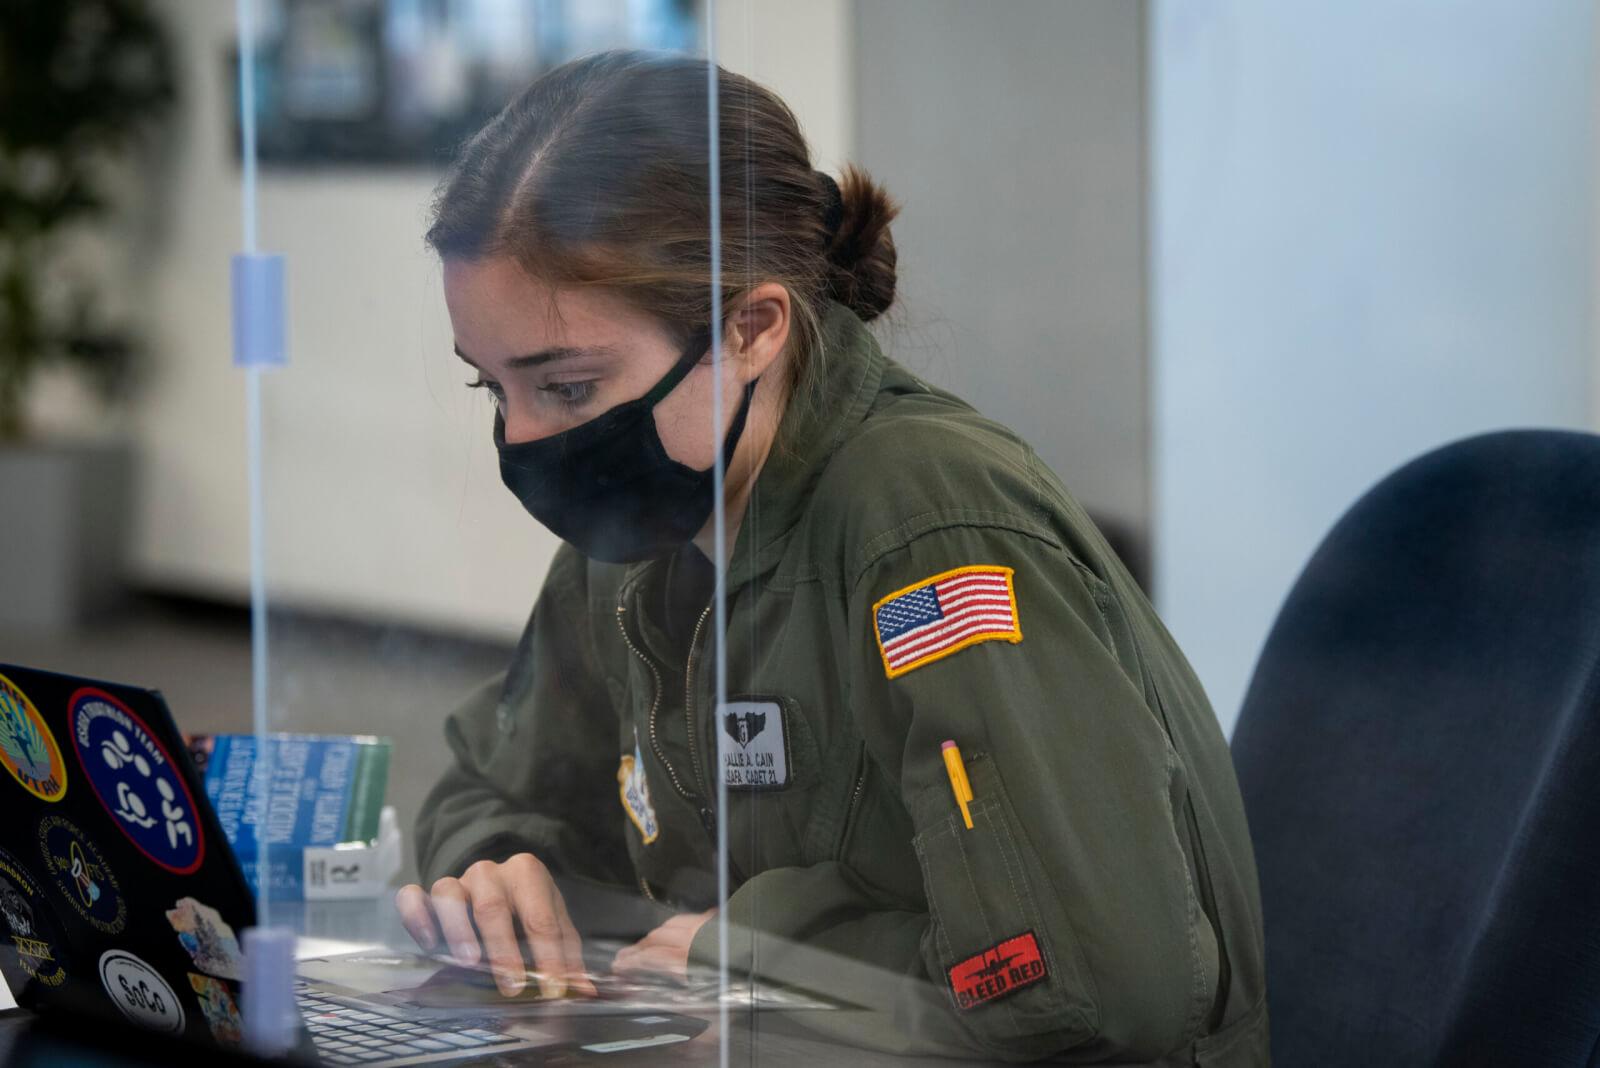 Cadet behind Plexiglass shield